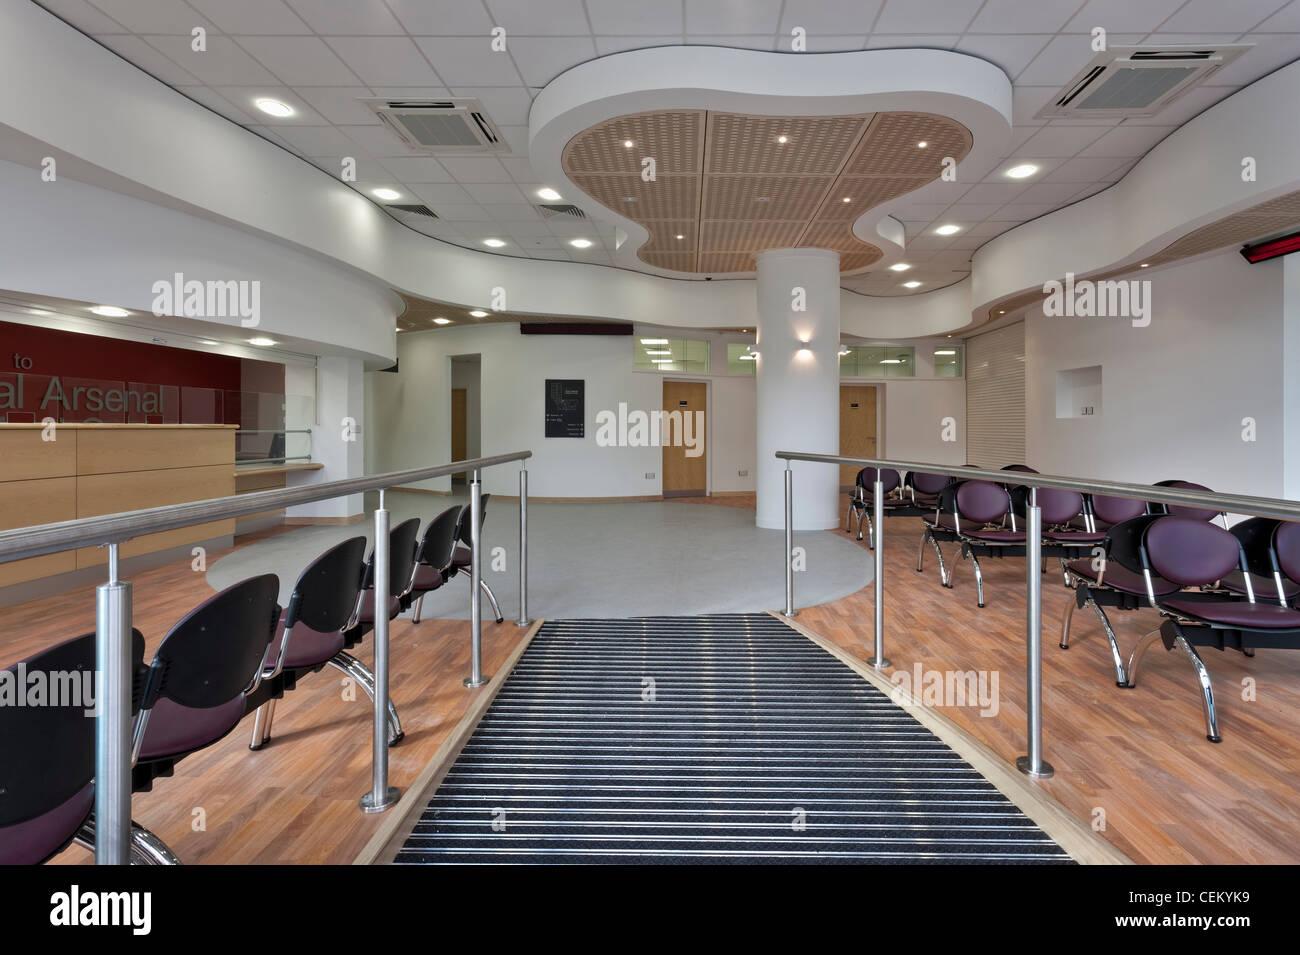 Medizinisches Zentrum Royal Arsenal in Woolwich Stockbild